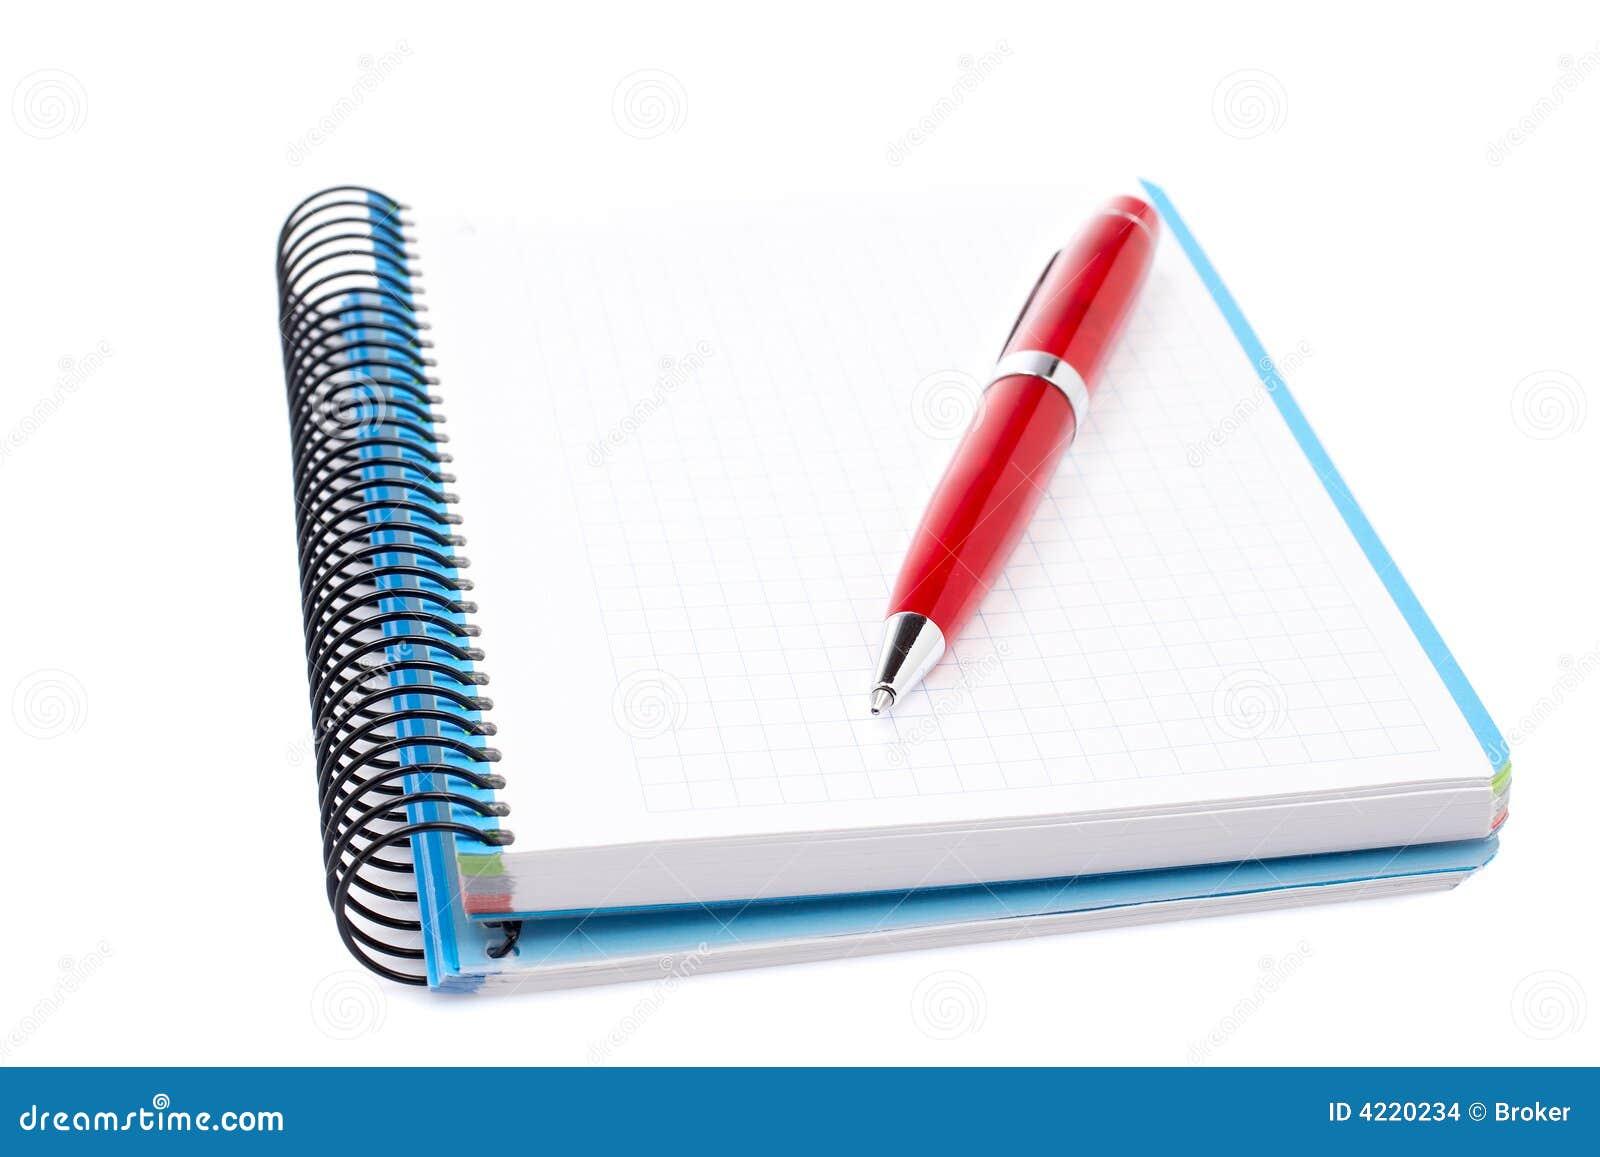 Blank notebook sheet with pen